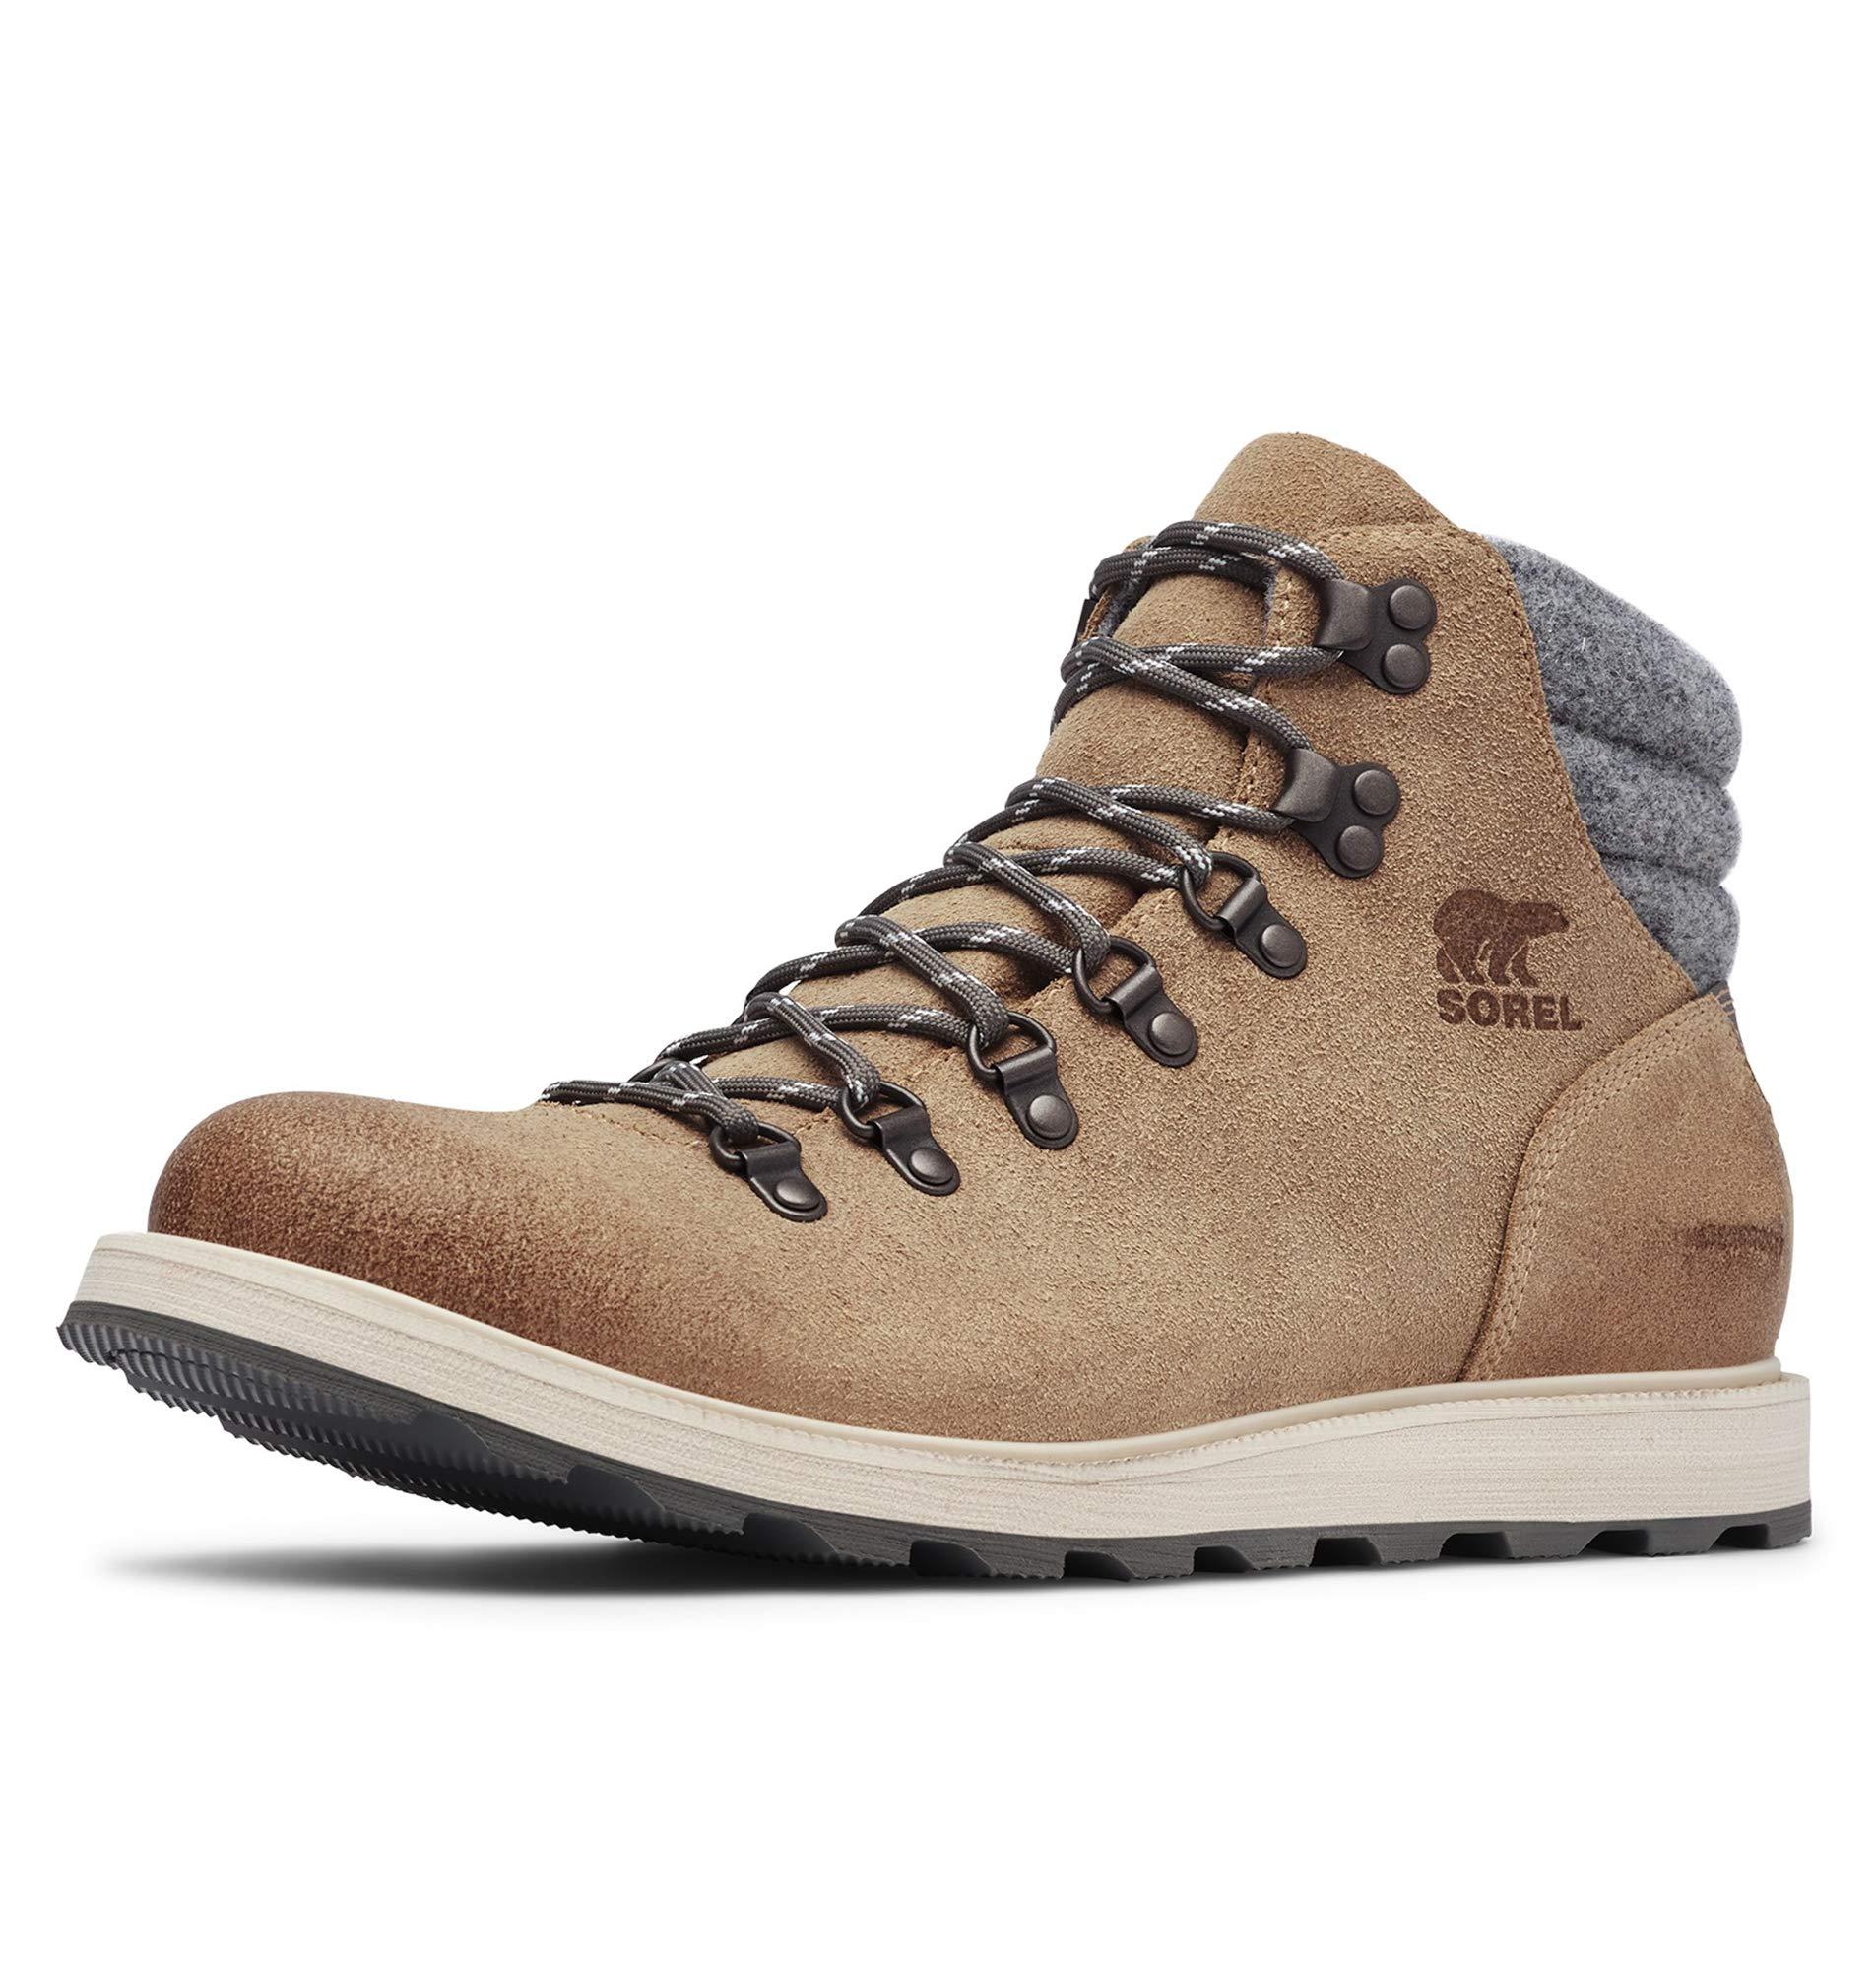 Sorel - Men's Madson Hiker Waterproof Boot, Oatmeal/Quarry, 9 M US by Sorel